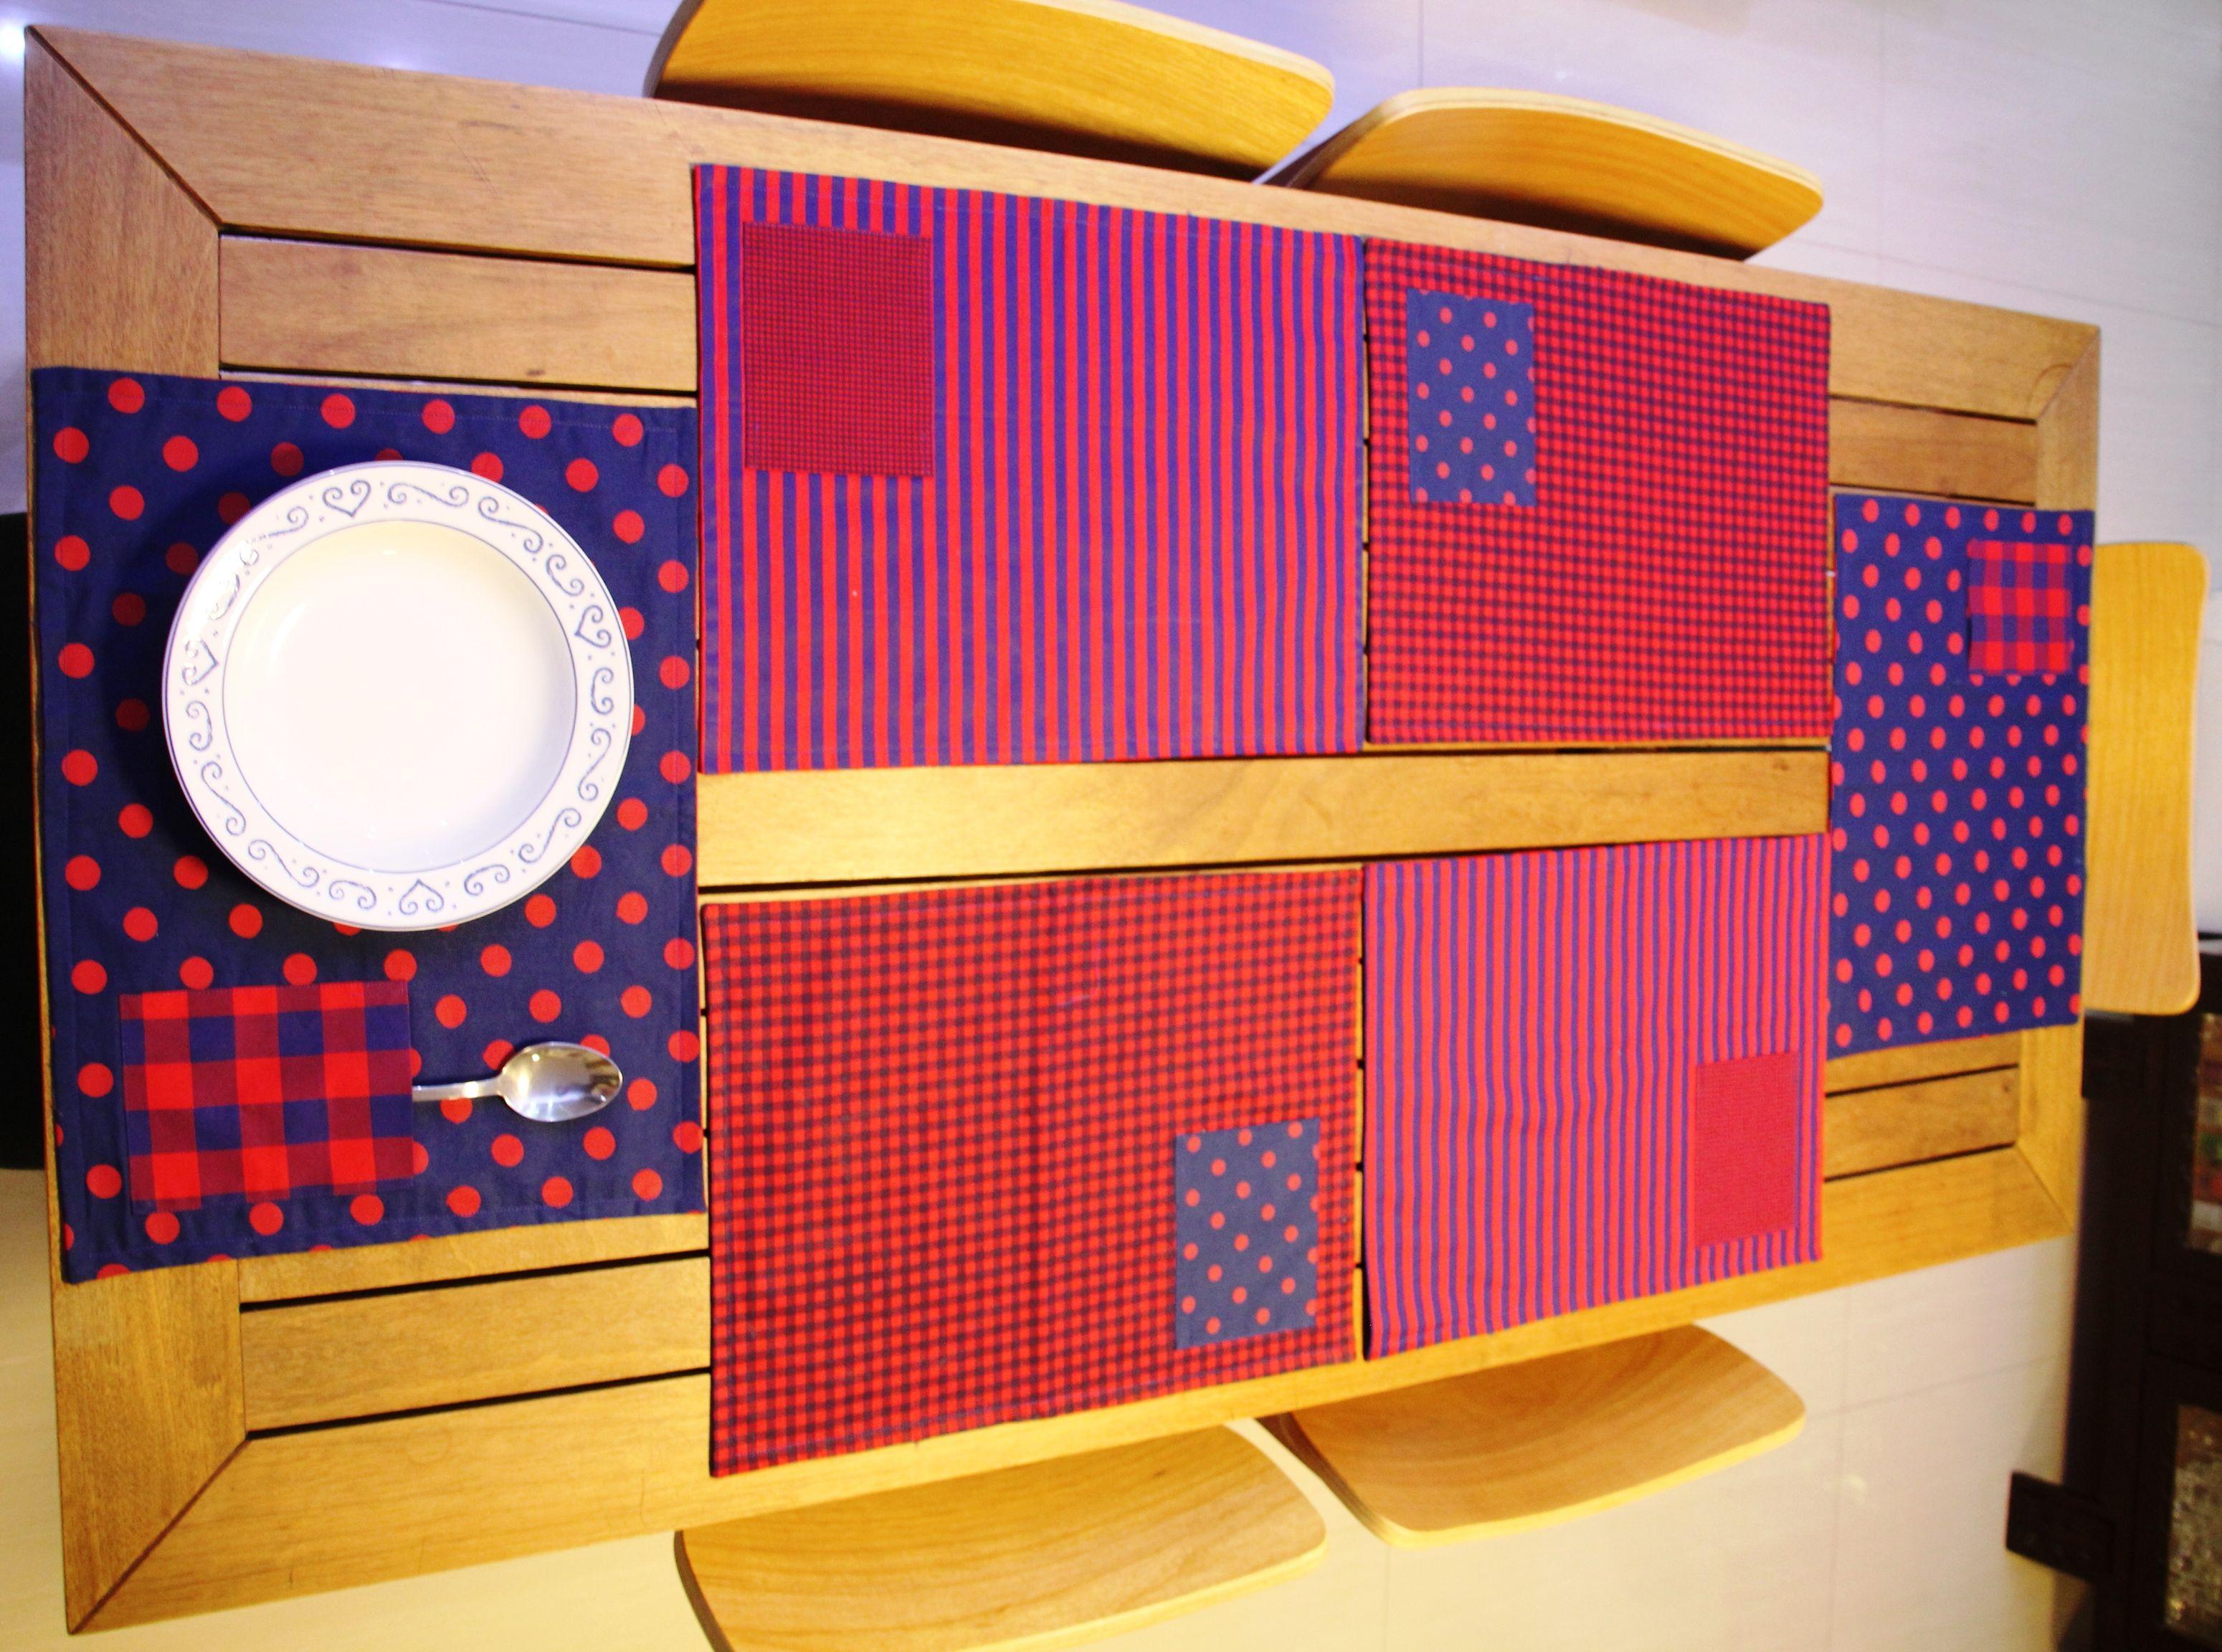 Jogo americano em patchwork.  #placemats #patchwork